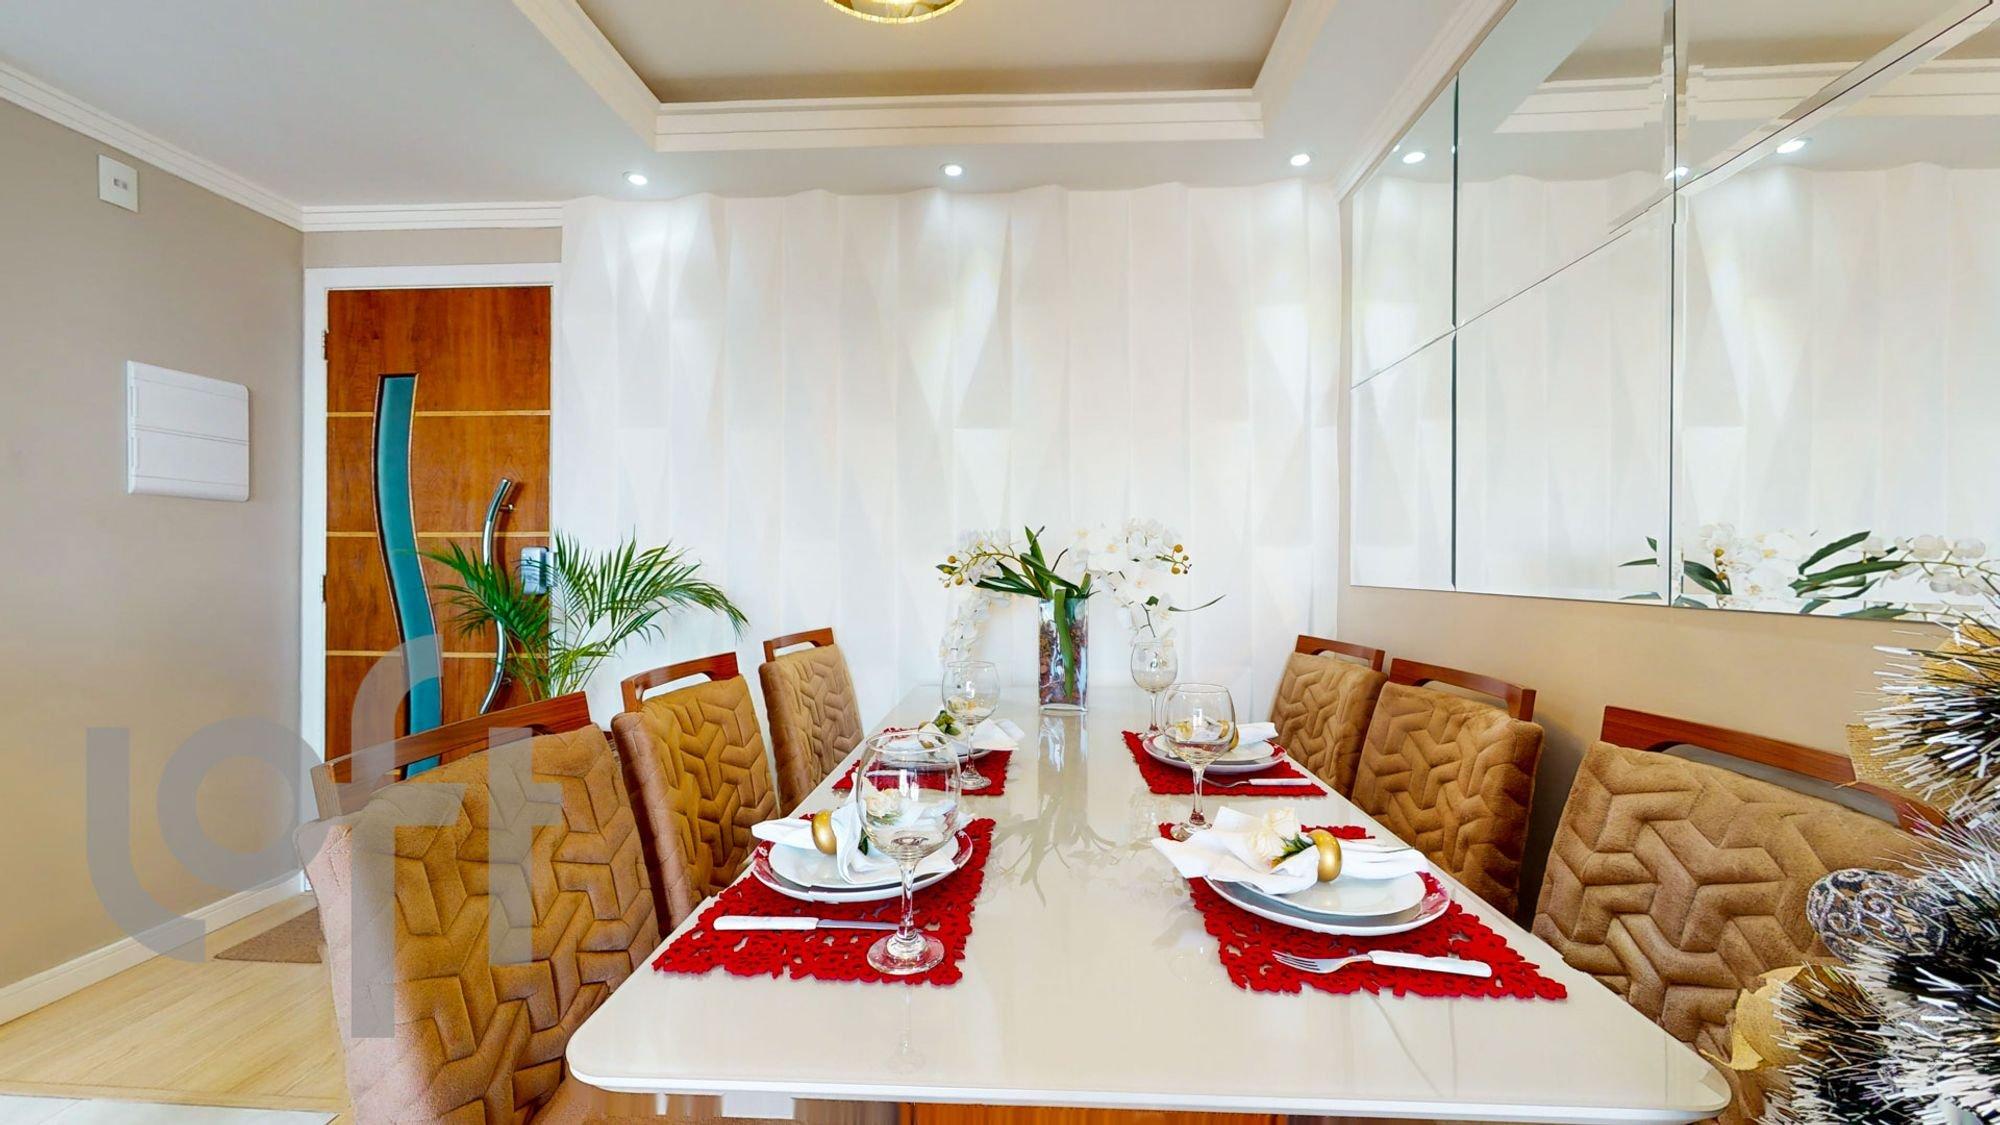 Foto de Sala com vaso de planta, copo de vinho, vaso, cadeira, mesa de jantar, xícara